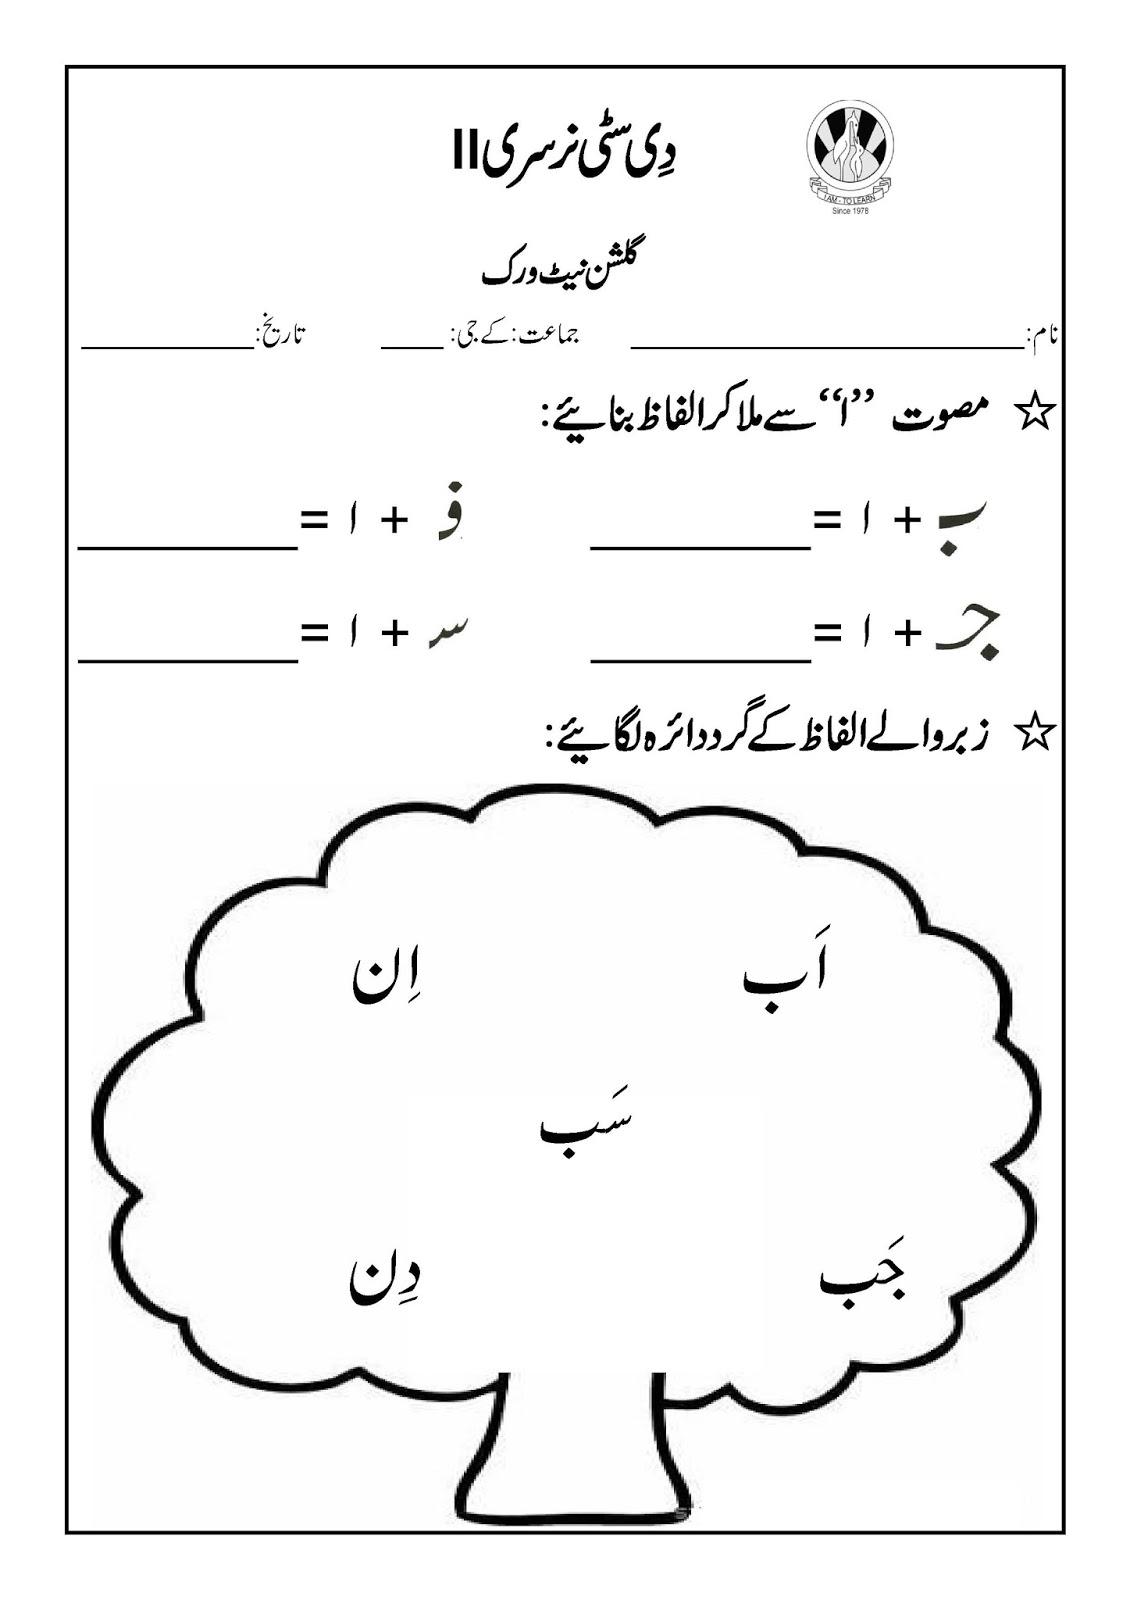 small resolution of Tafheem Worksheets In Urdu   Printable Worksheets and Activities for  Teachers